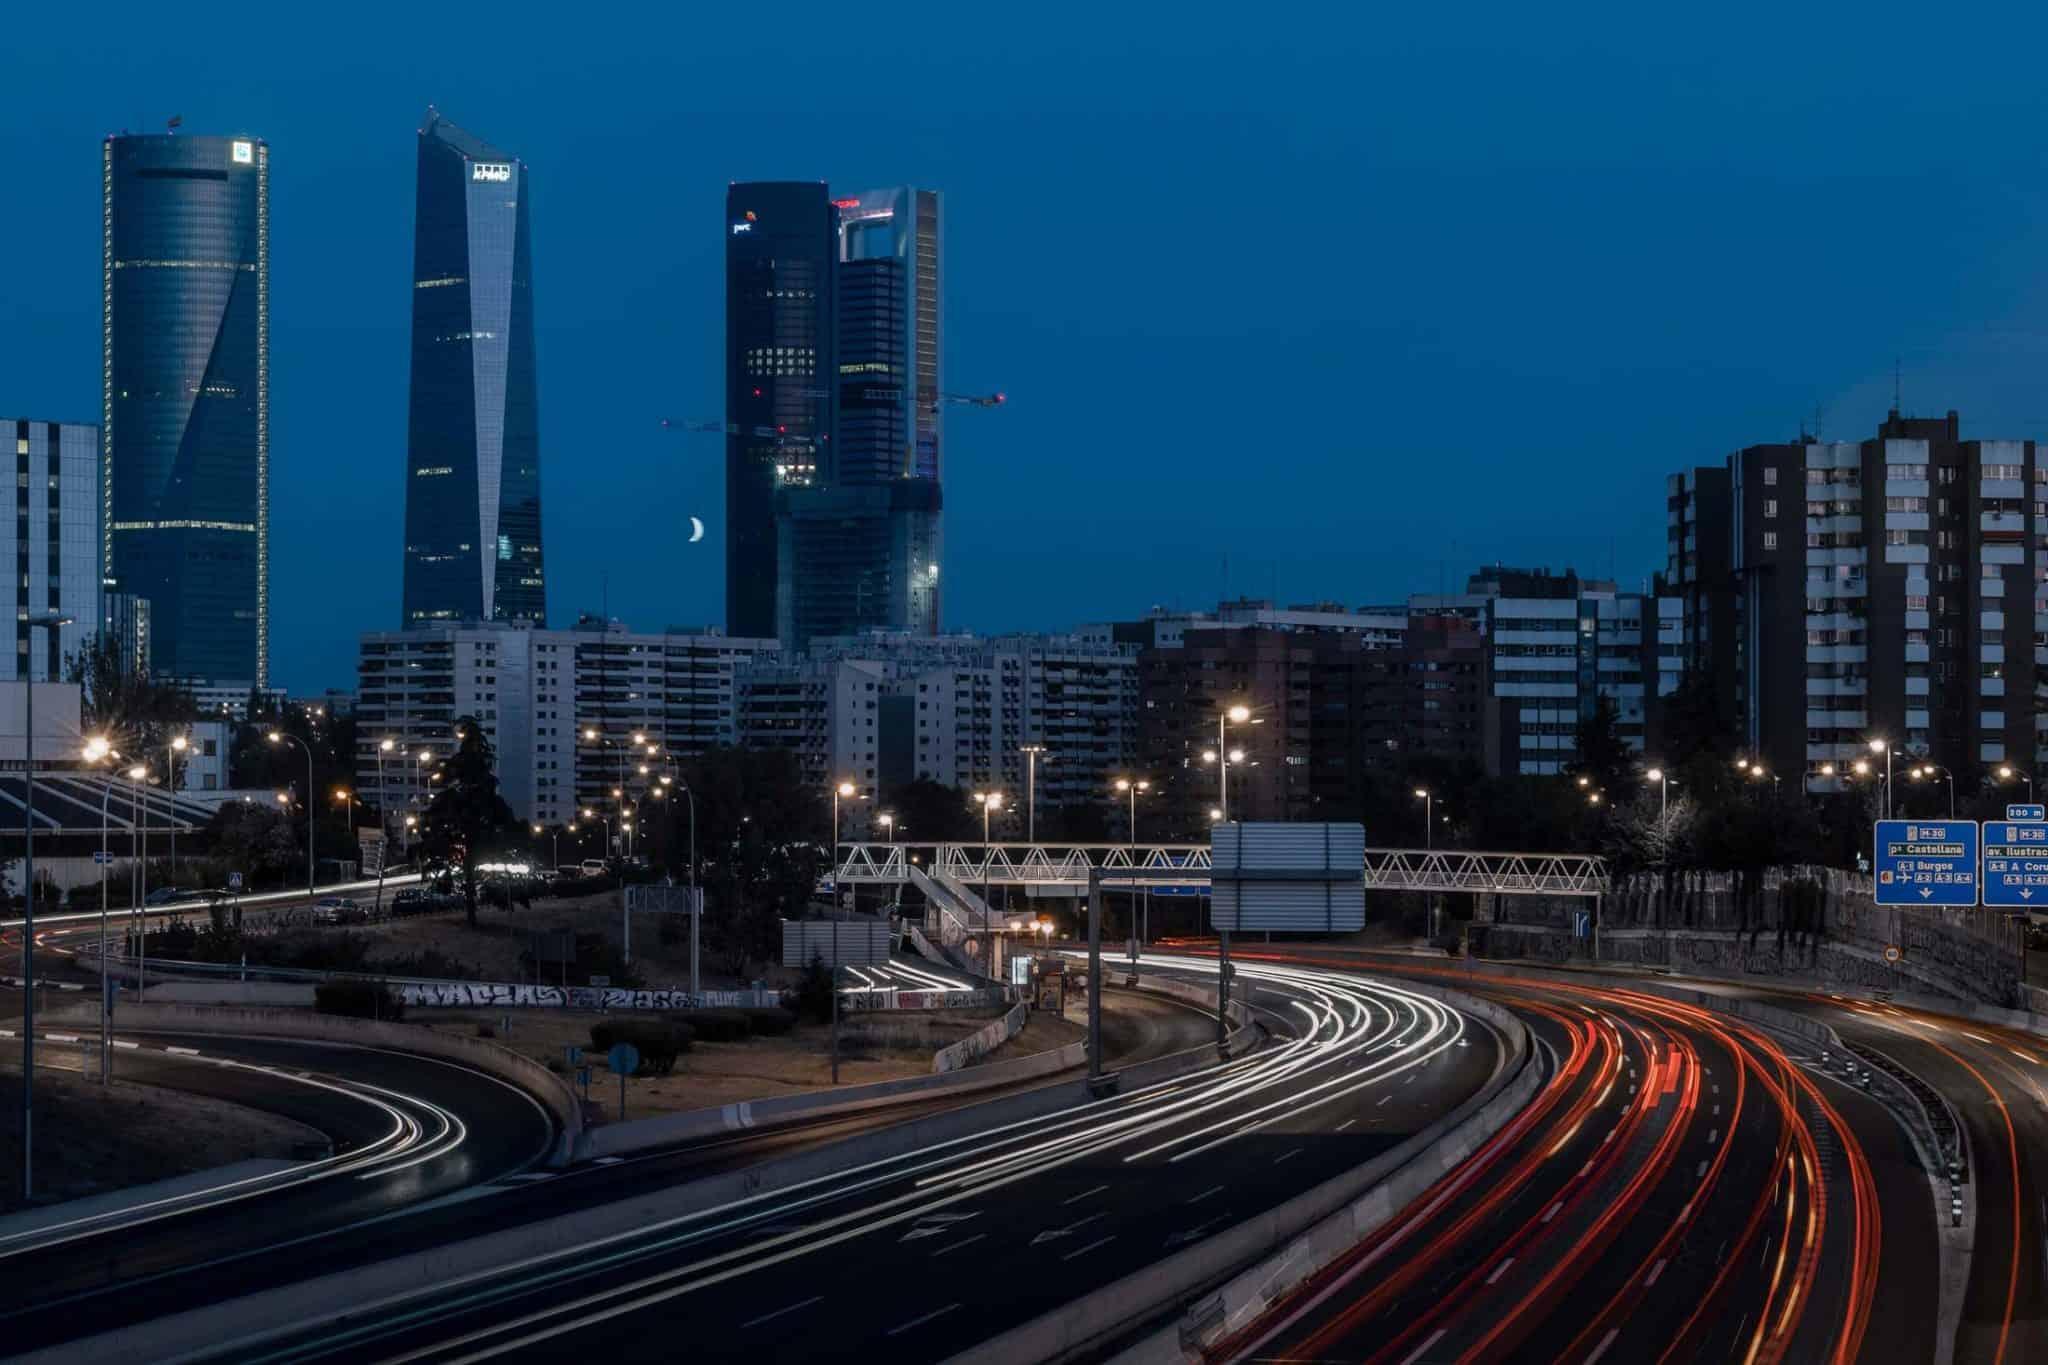 Maan boven Madrid